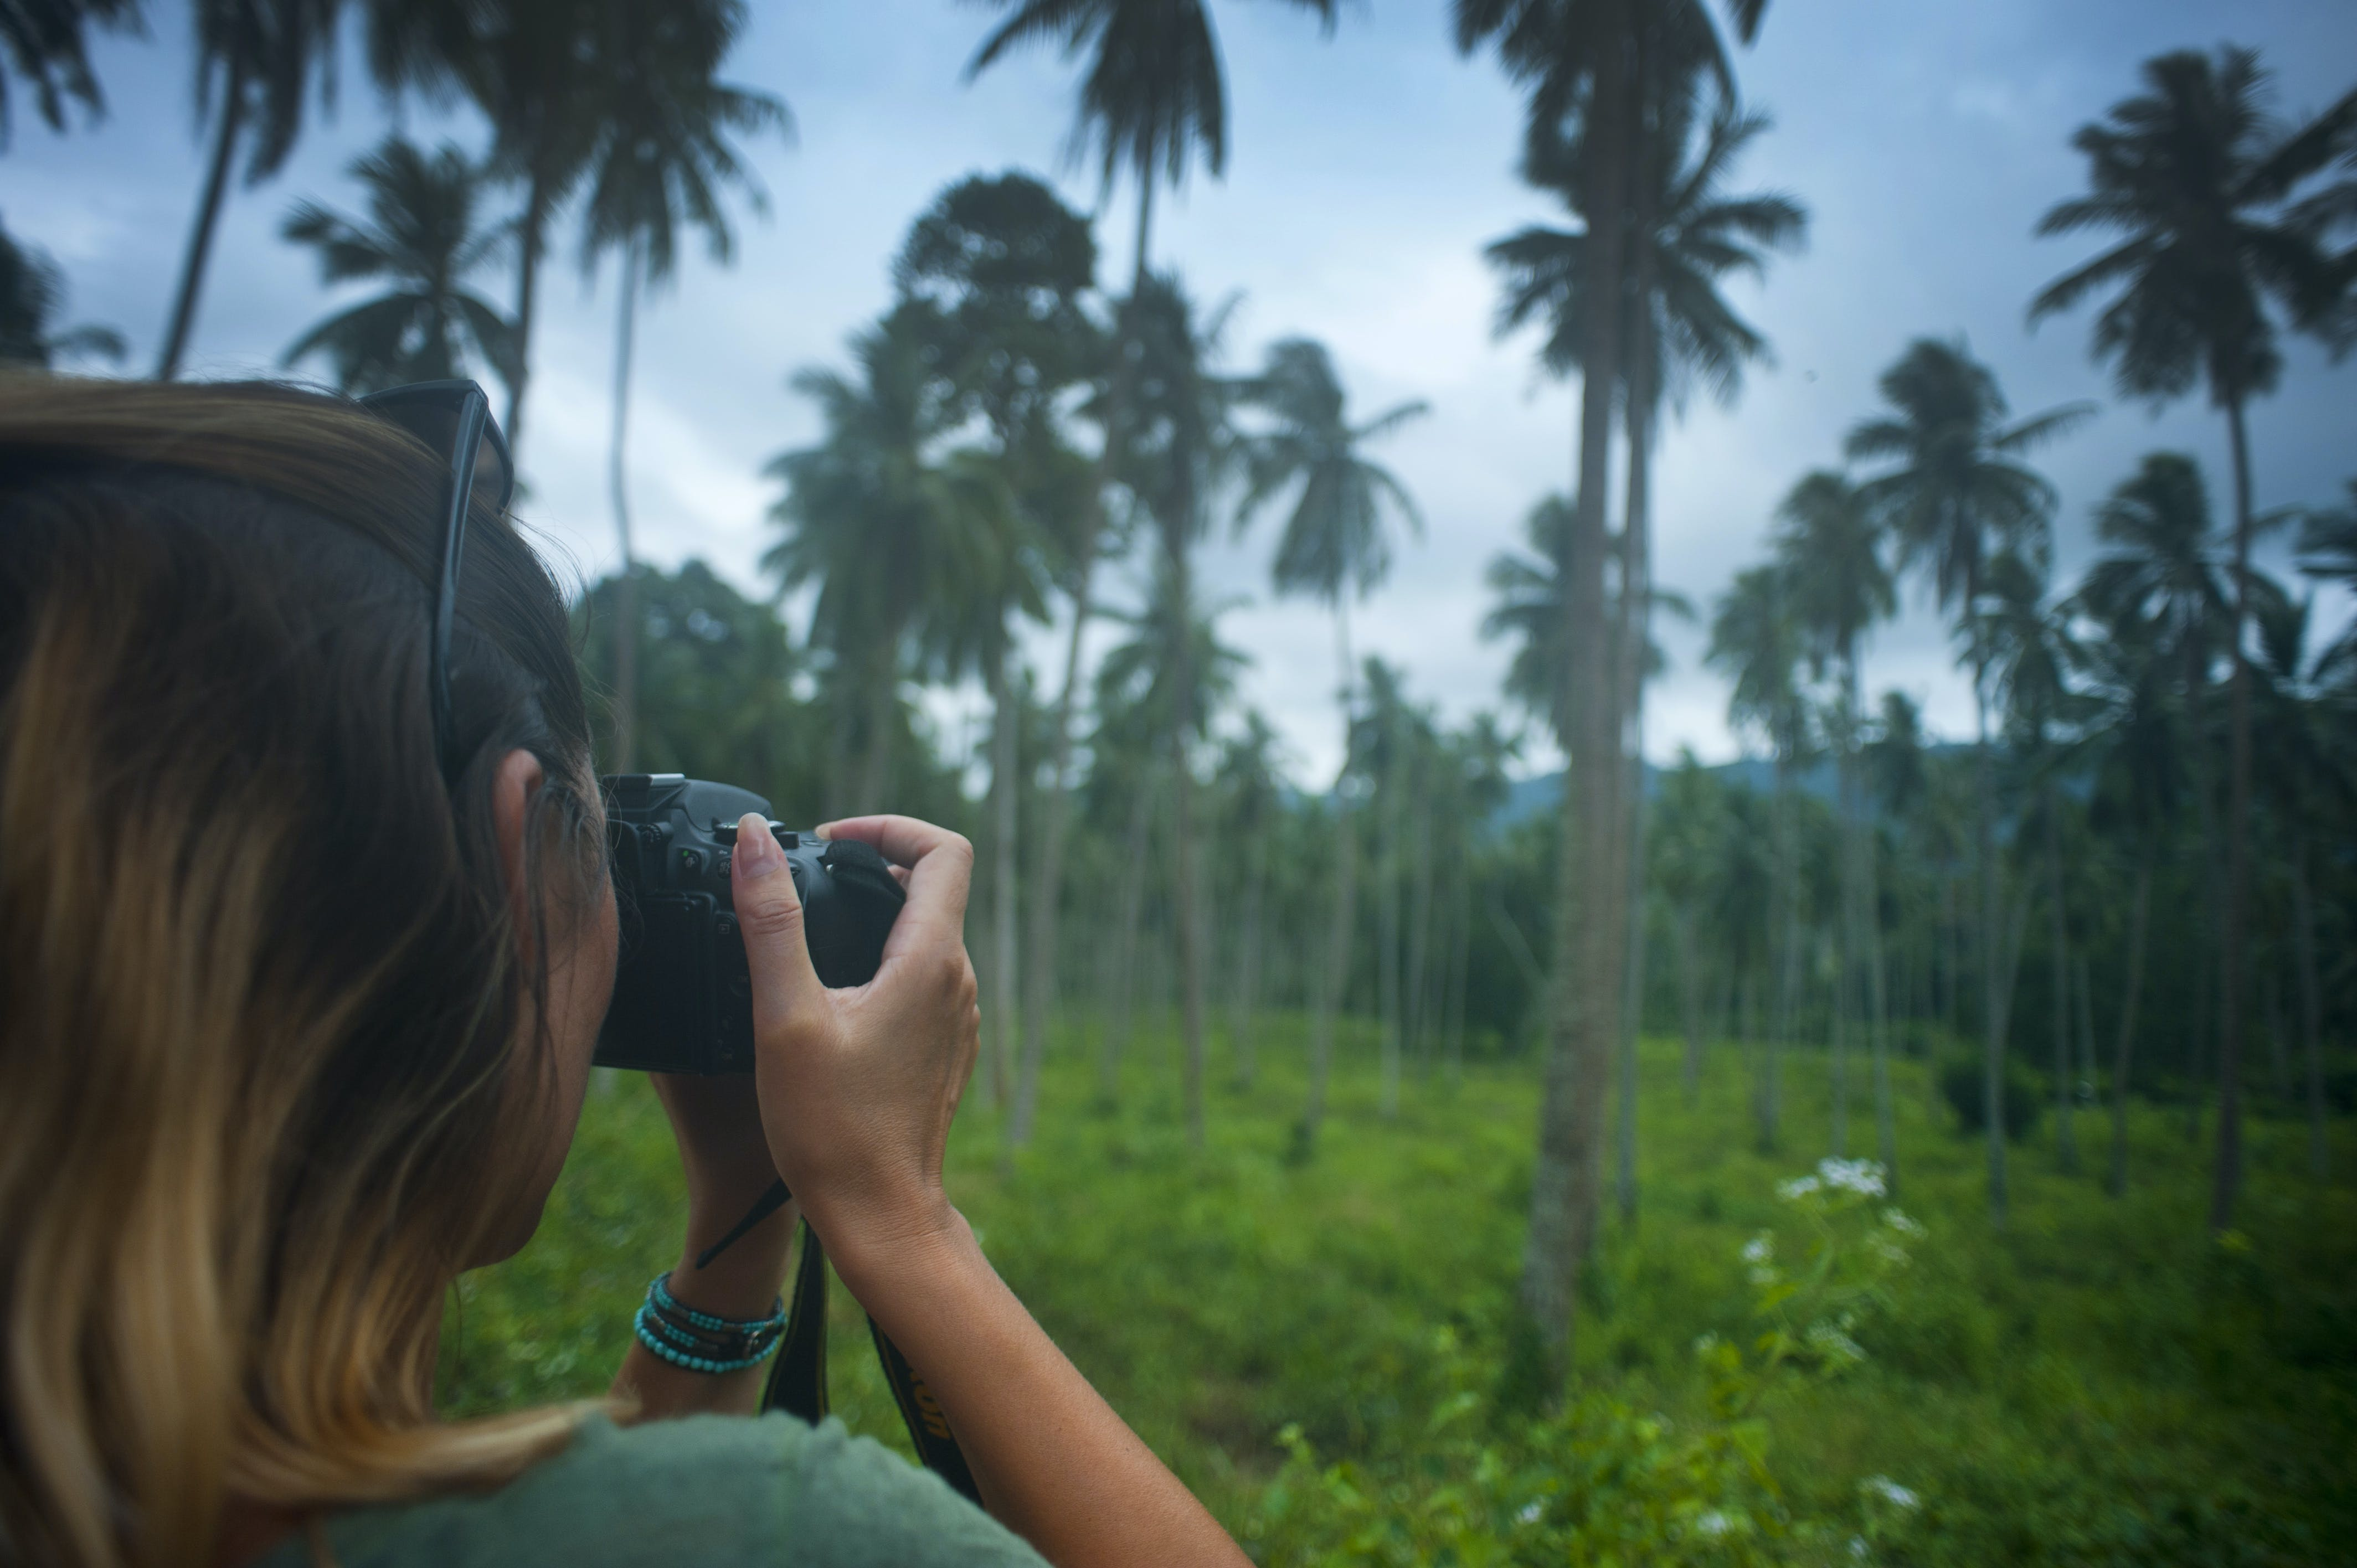 Woman Holding Dslr Camera Taking Photo